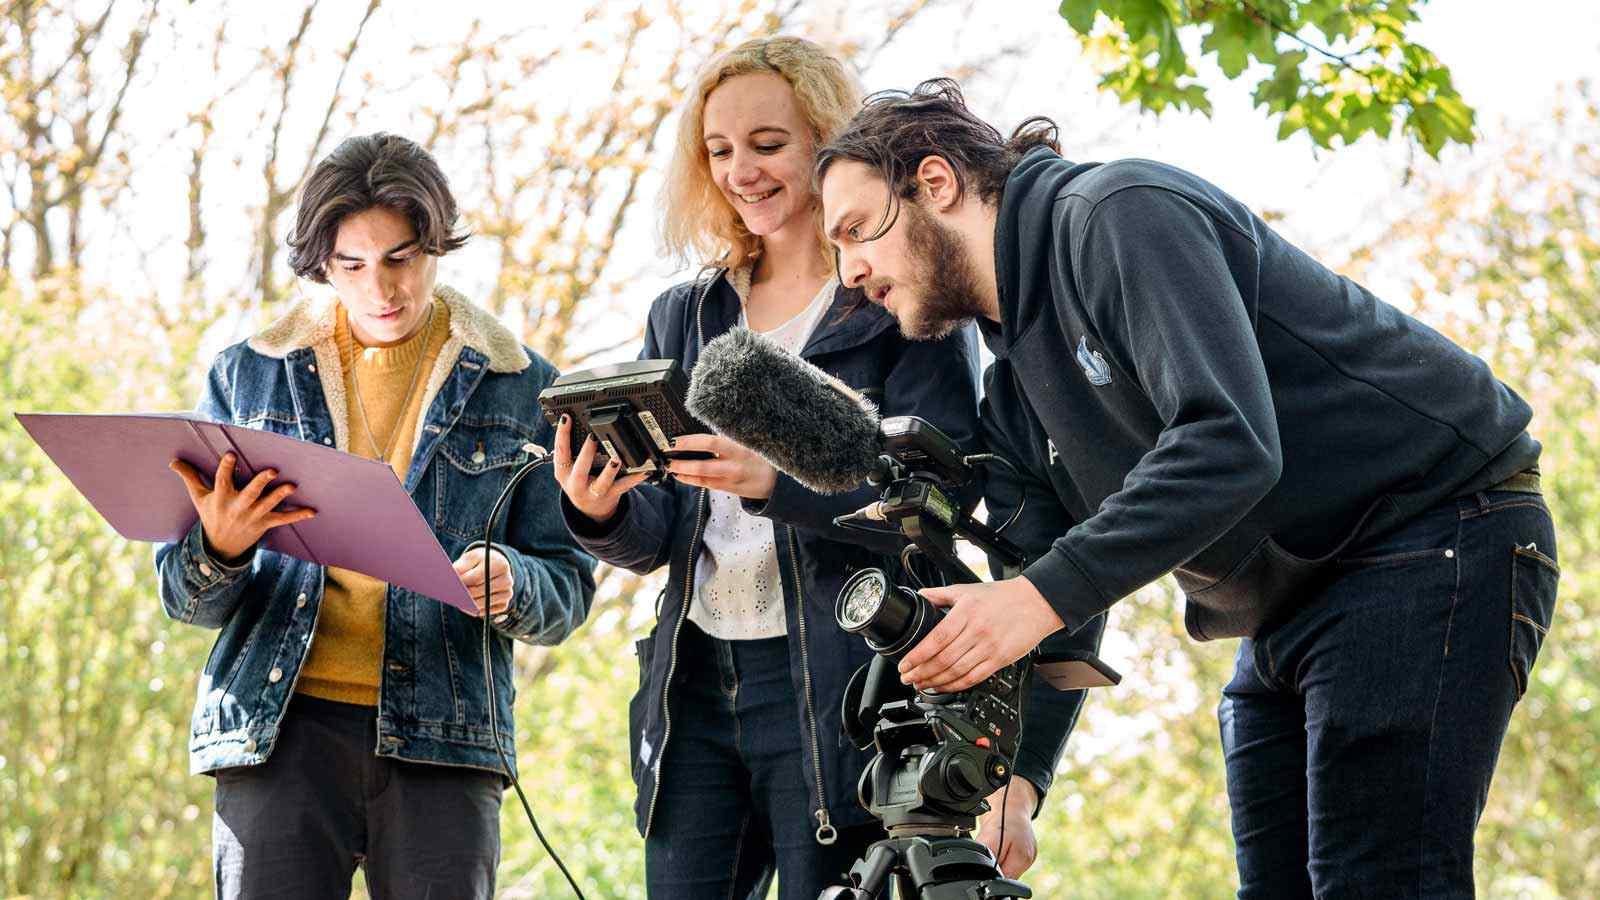 Students using film equipment outside